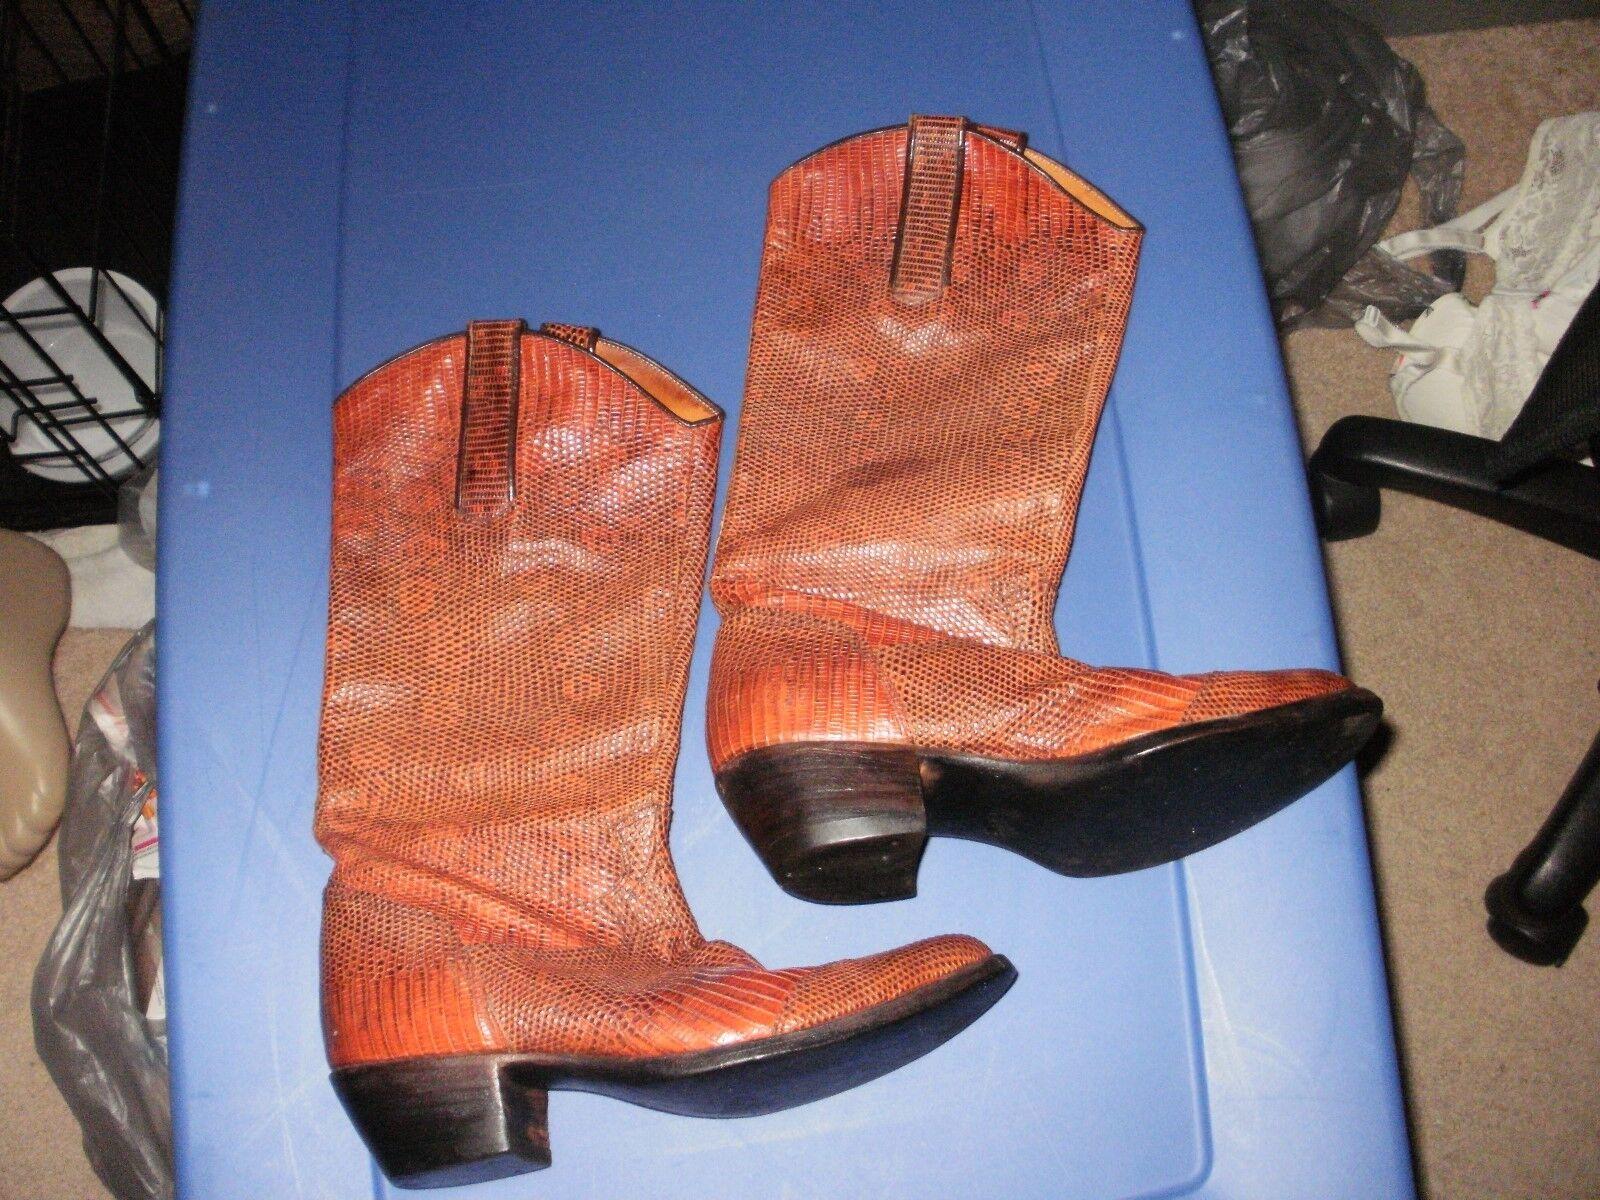 Der Dau 6.5 Damas botas Completo Completo Completo Personalizado Lagarto Vintage occidental rojizo Usa 20a5a6